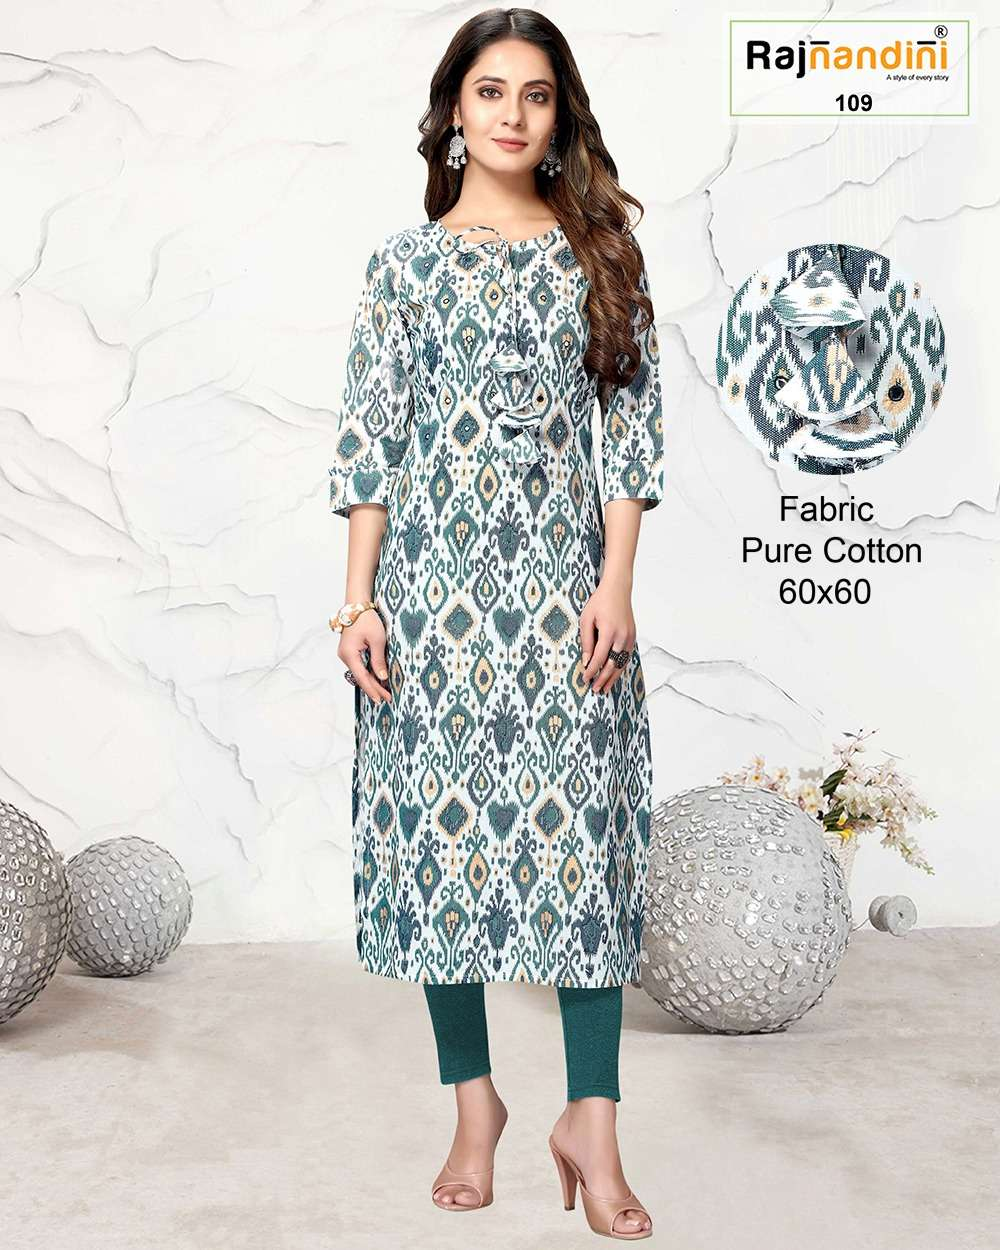 Rajnandini Vol B Fancy Printed Cotton Kurti Catalog Wholesaler